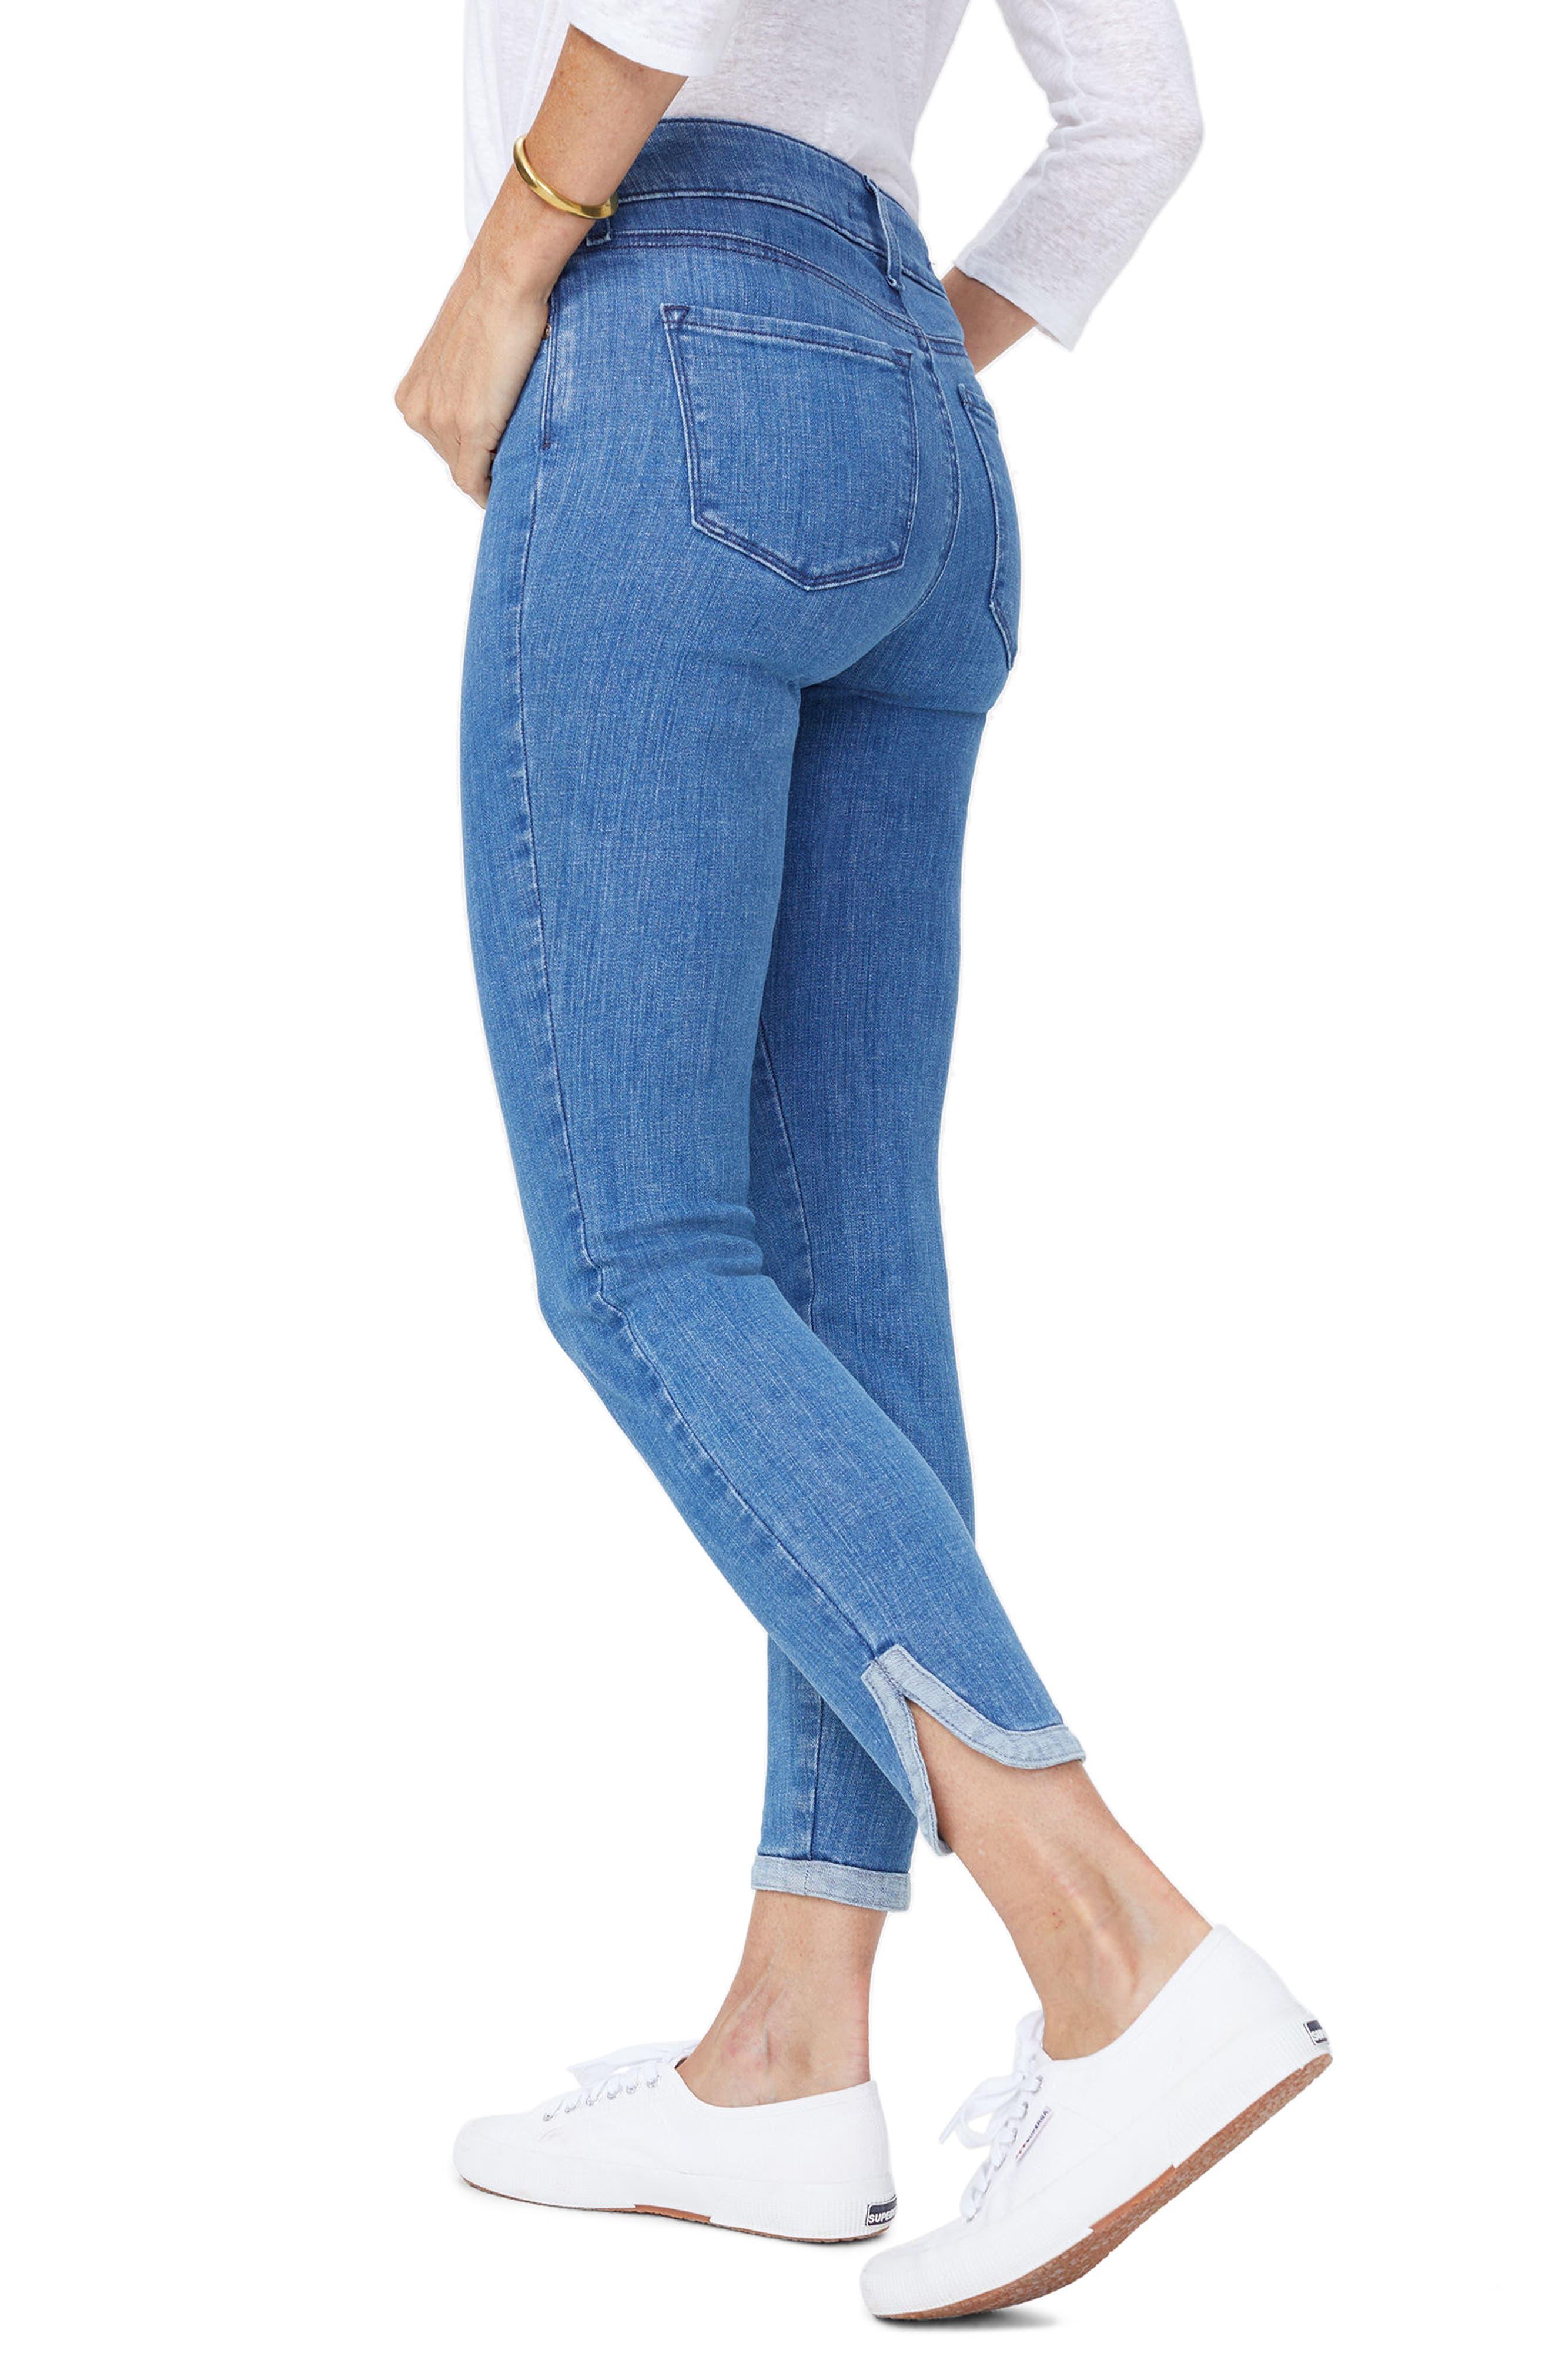 Ami Side Slit Ankle Skinny Jeans,                             Alternate thumbnail 2, color,                             Bliss